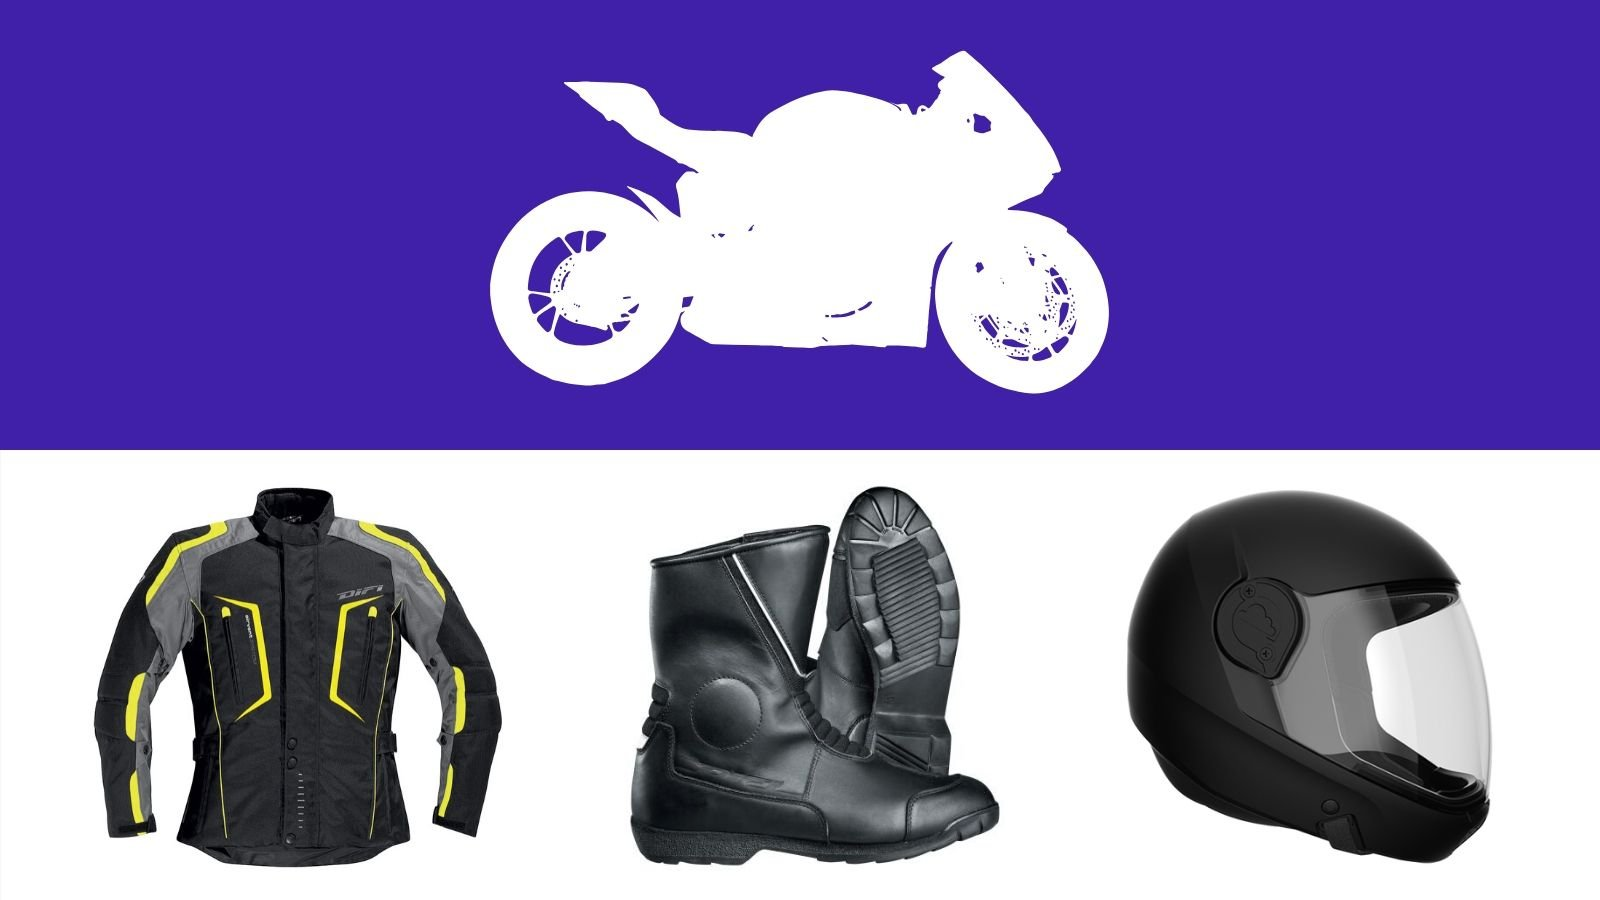 Motosiklet Kıyafet Ve Donanım (Kask, Dizlik, Vb.)